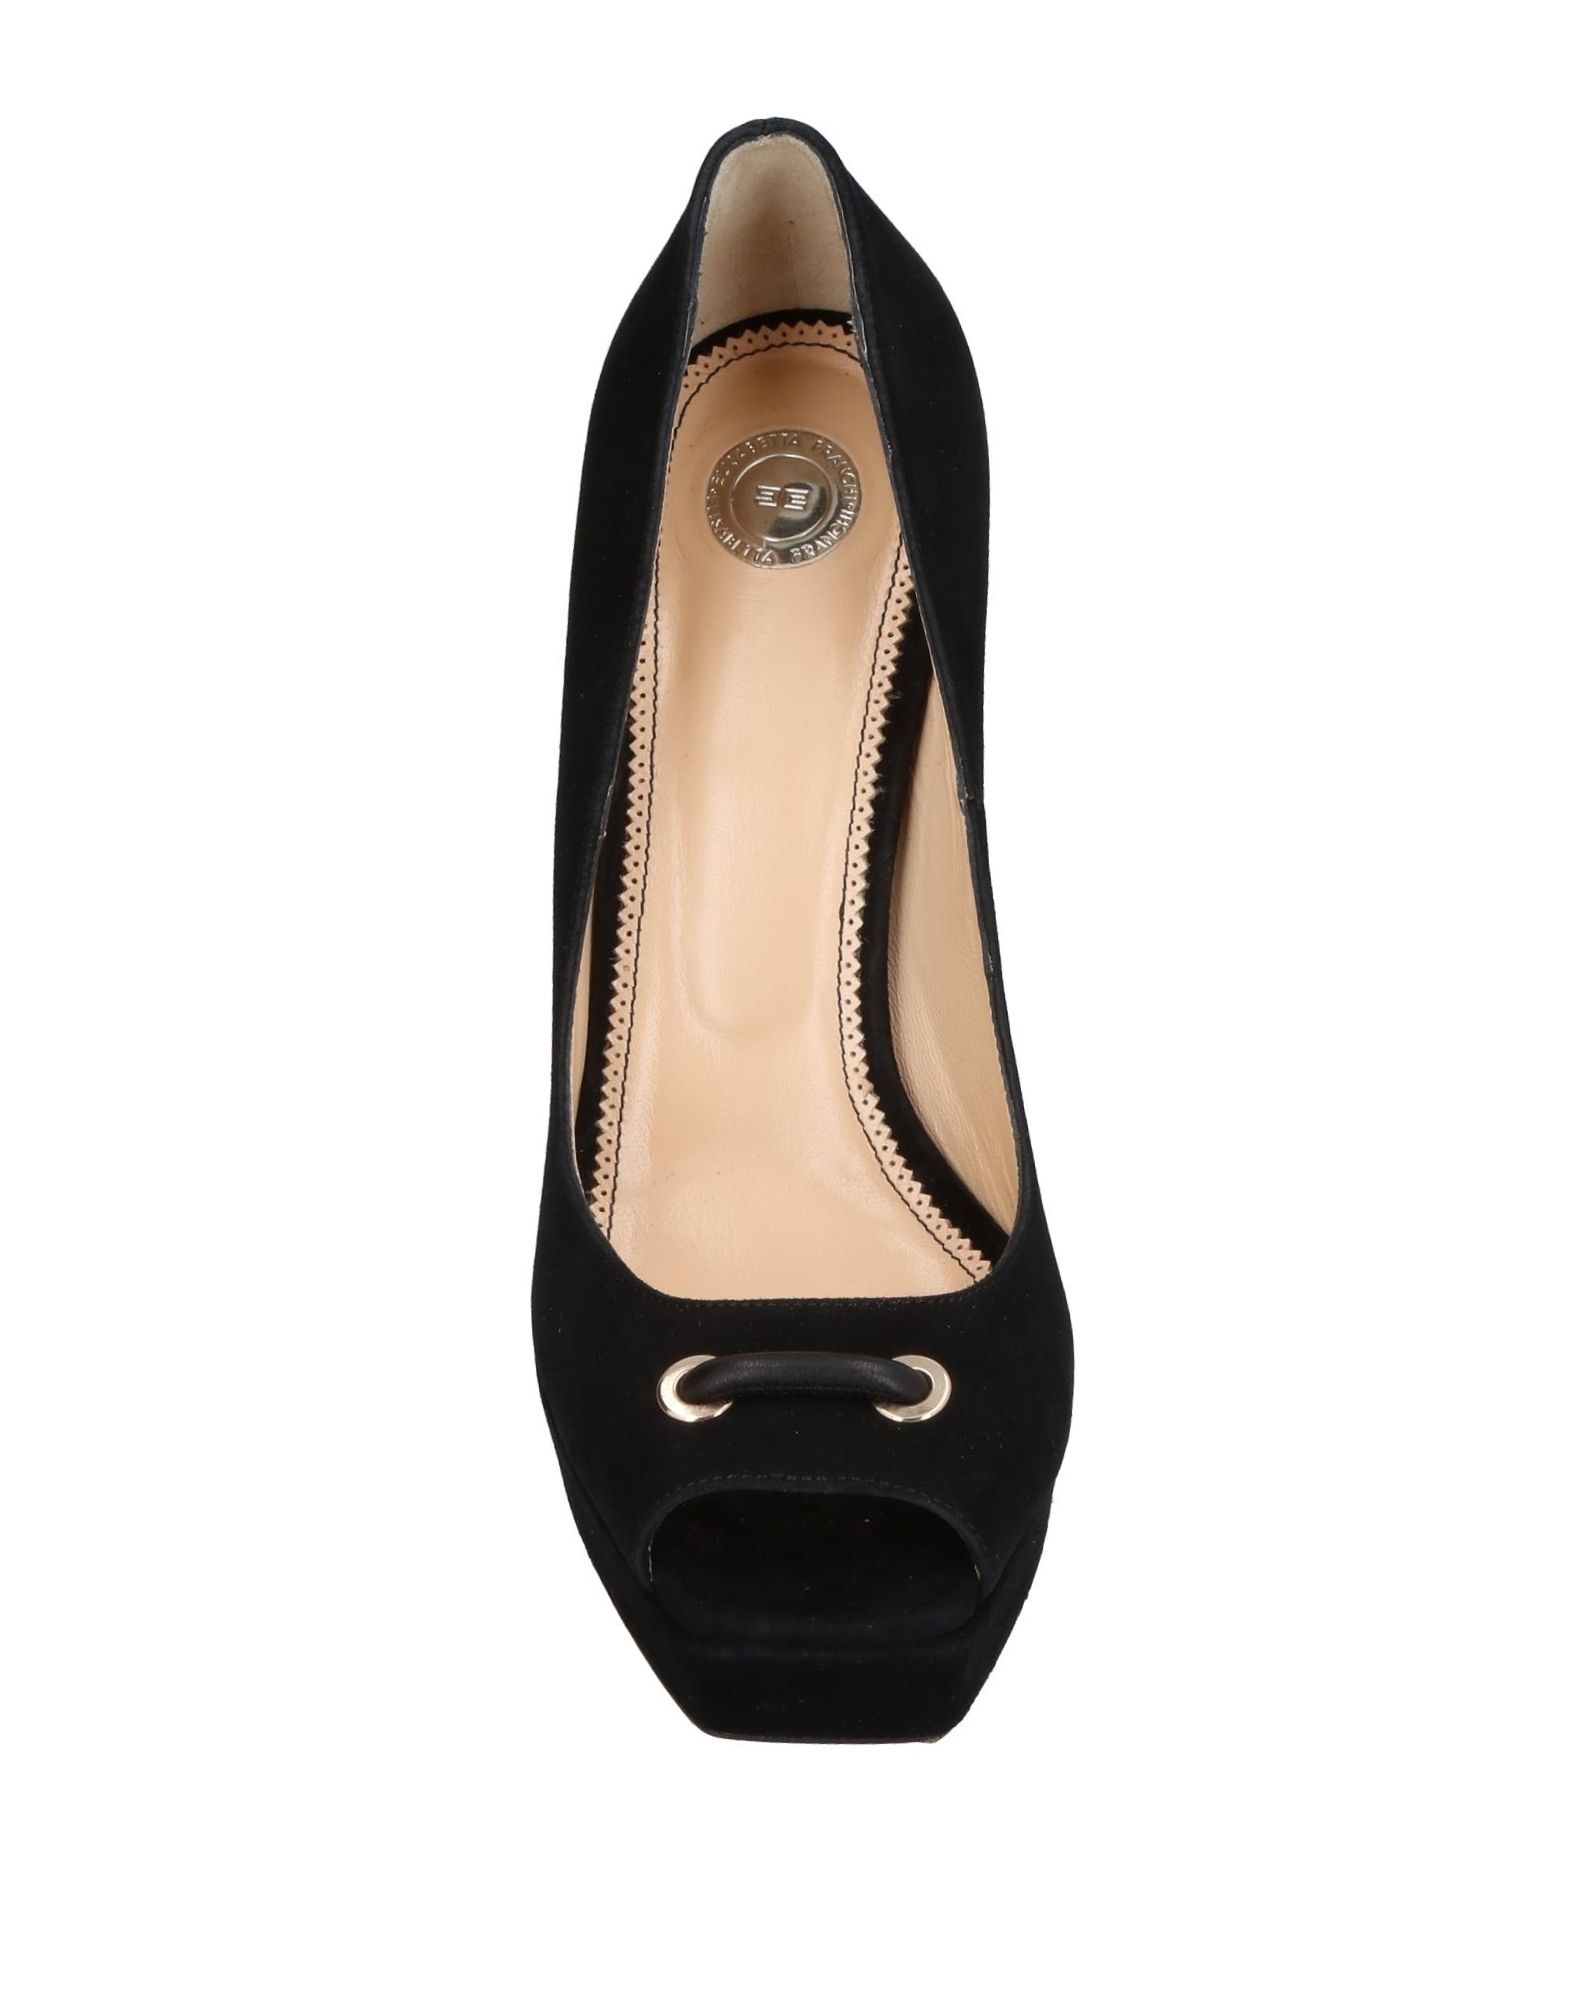 Elisabetta Franchi Pumps Damen Schuhe  11387878NHGut aussehende strapazierfähige Schuhe Damen c46a2c